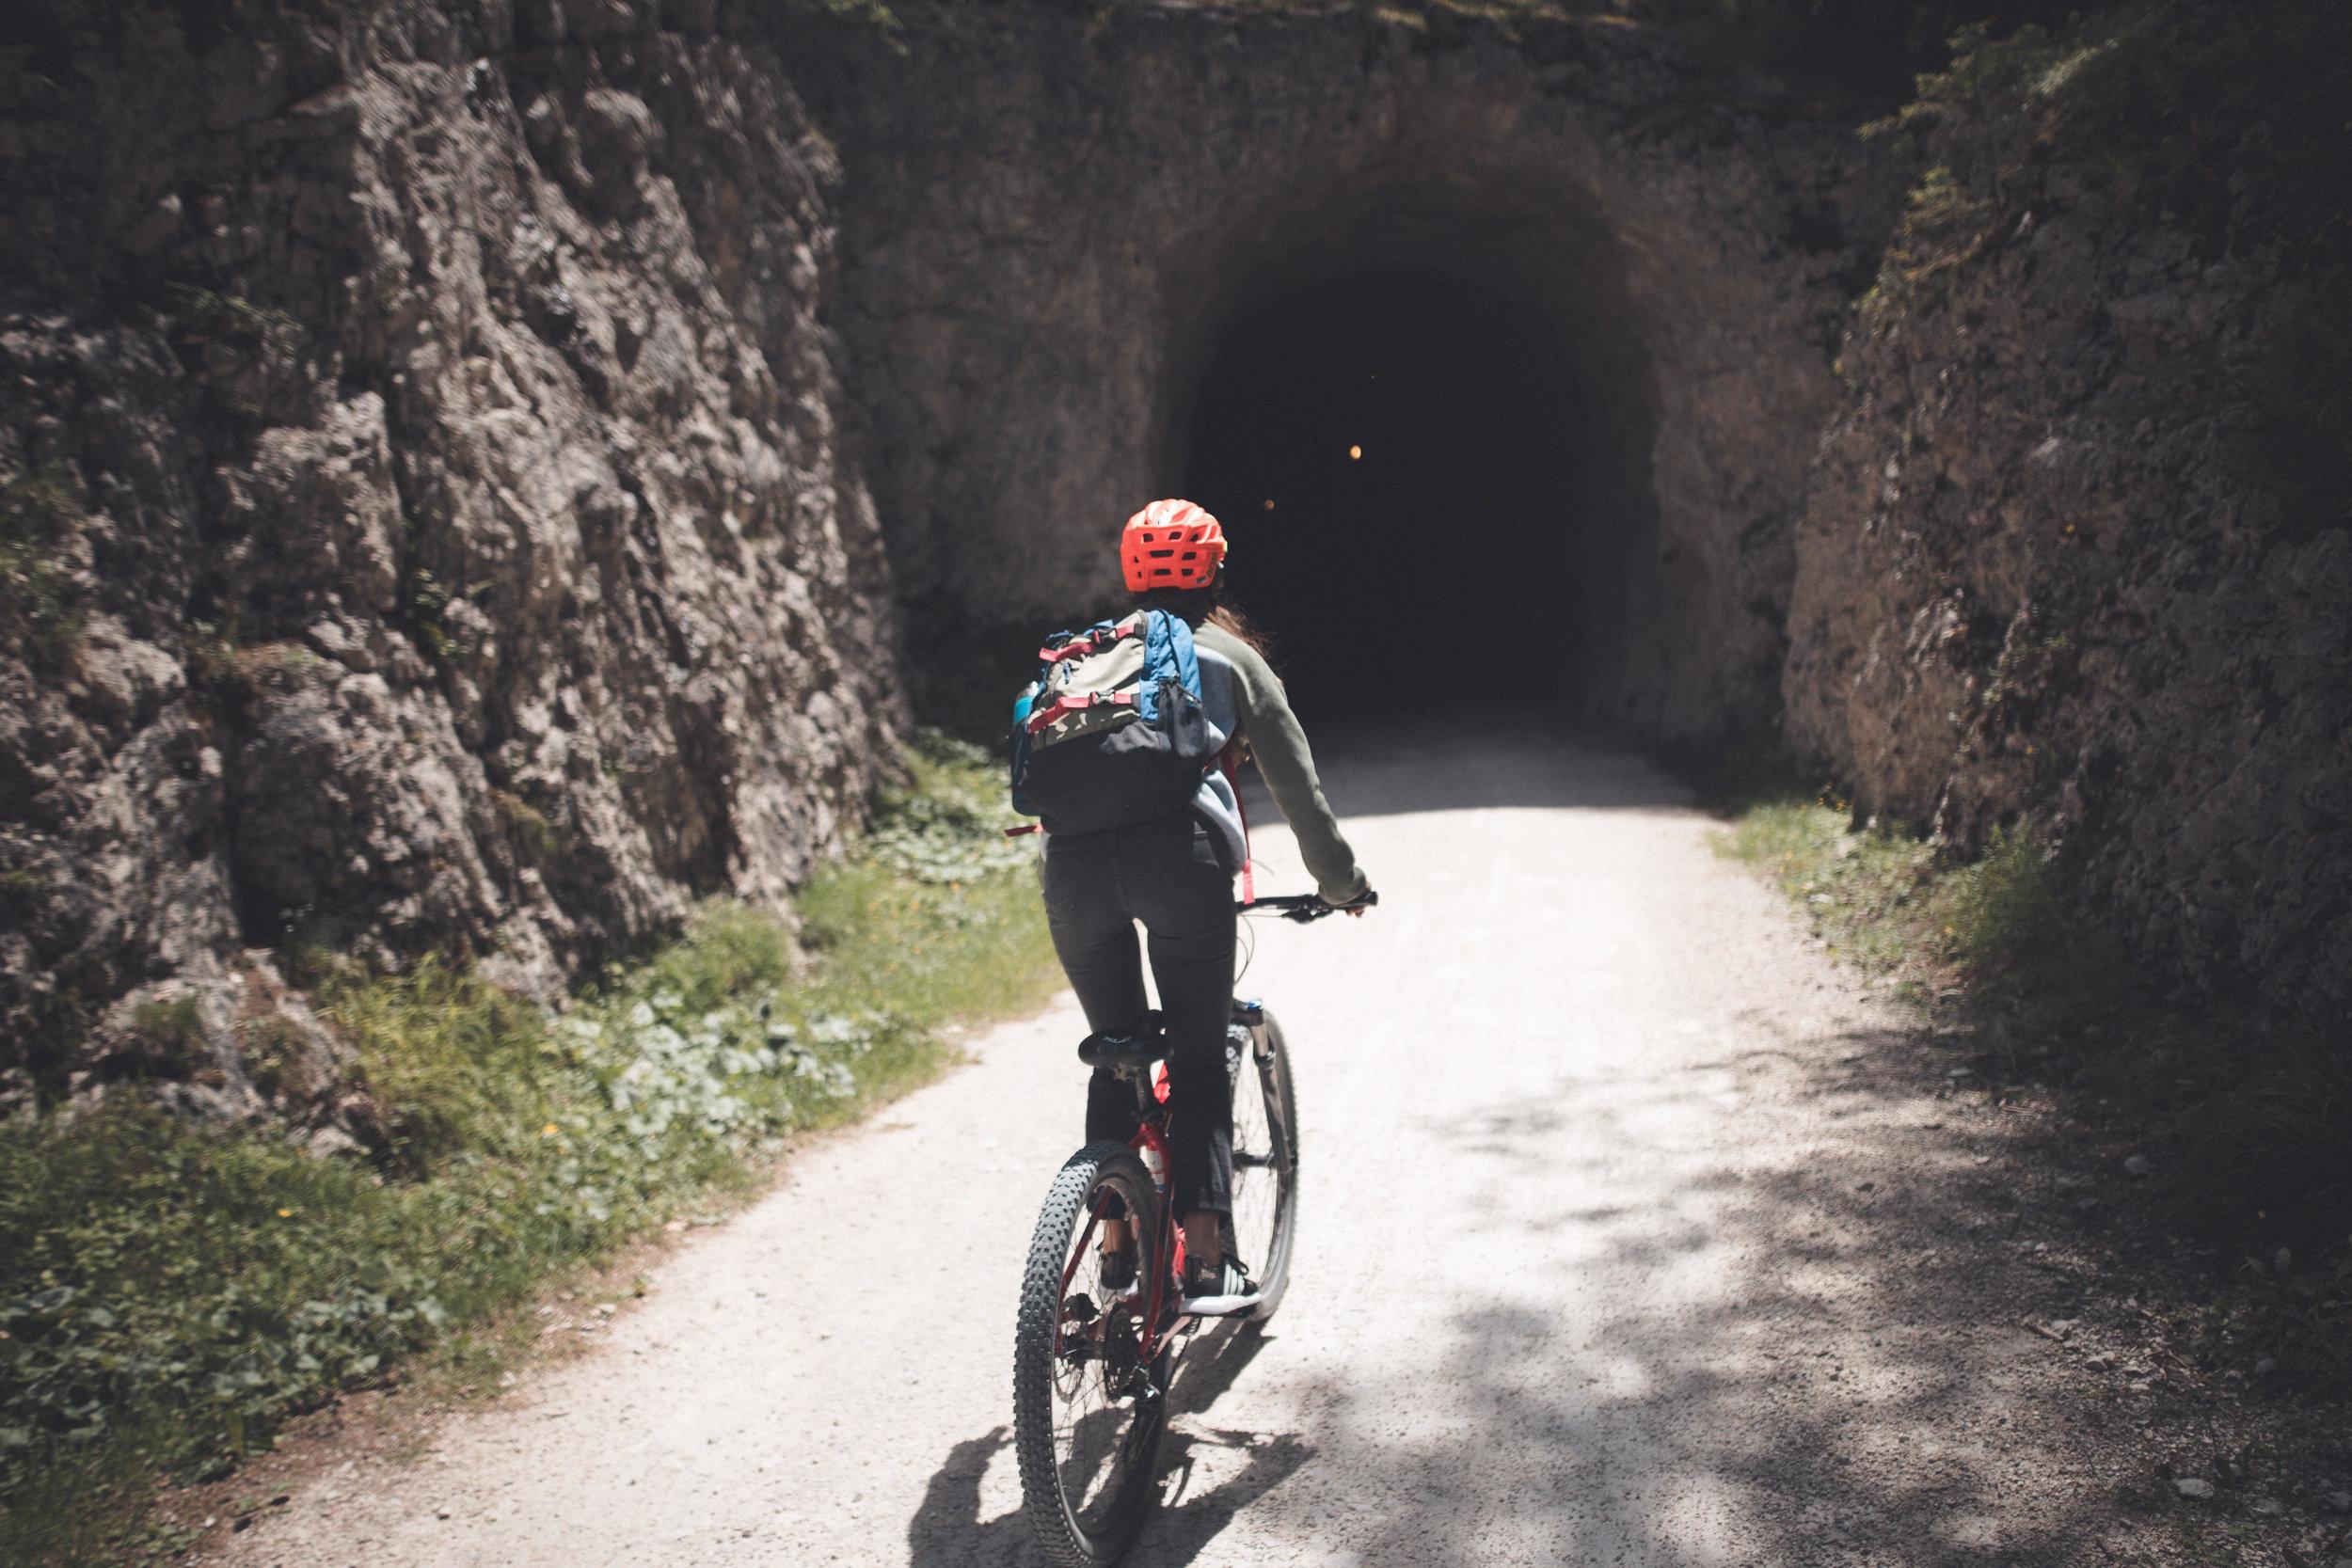 MeganKee_bike.jpg